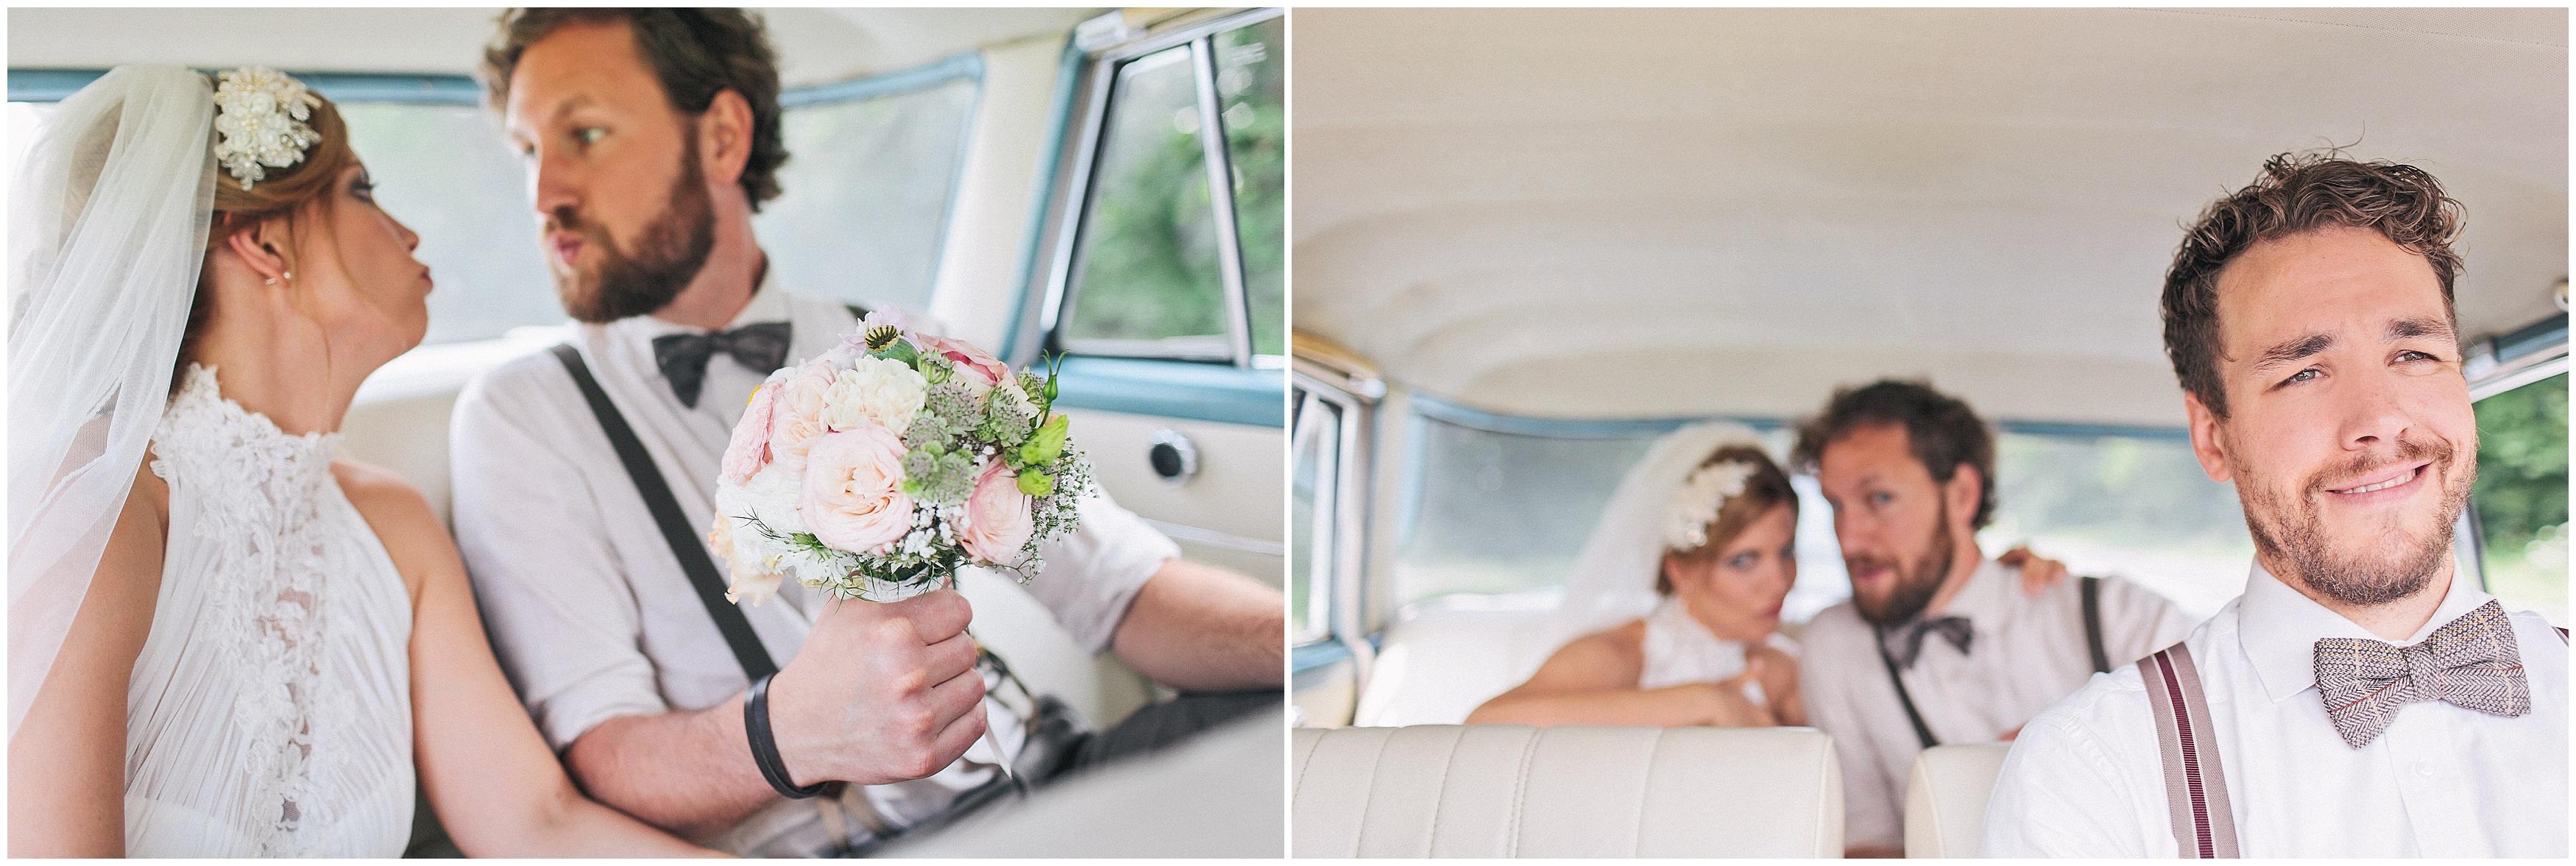 ivy&olive_Hochzeitsplanung_Nancy_Ebert_Fotografie_Vintage_Wedding_0015